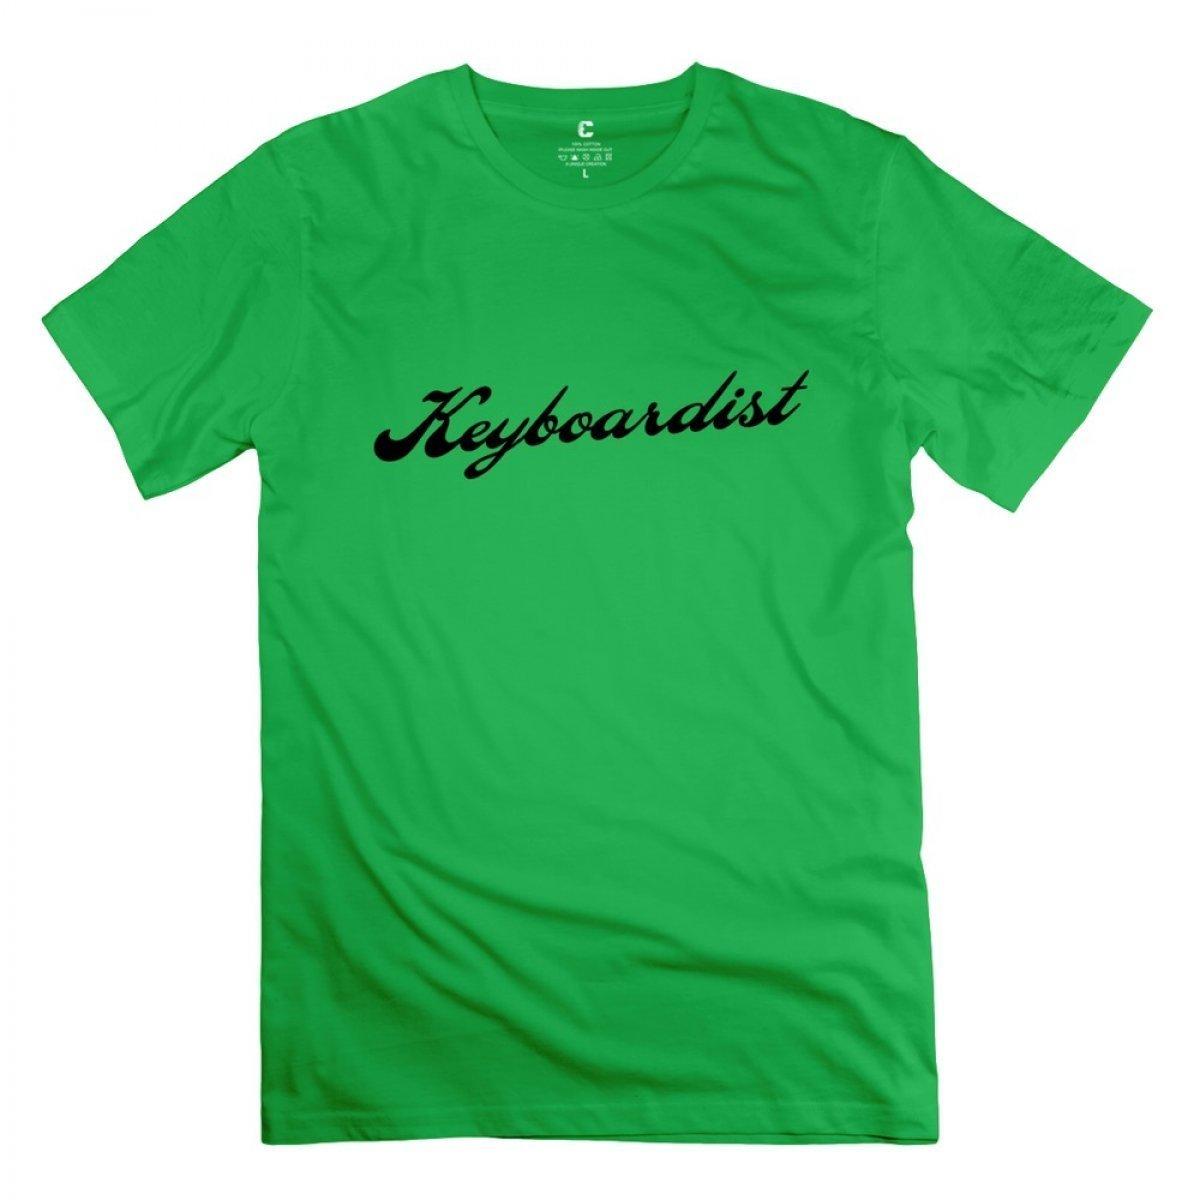 Keyboardist Forest Green Crew Neck T Shirts 5906